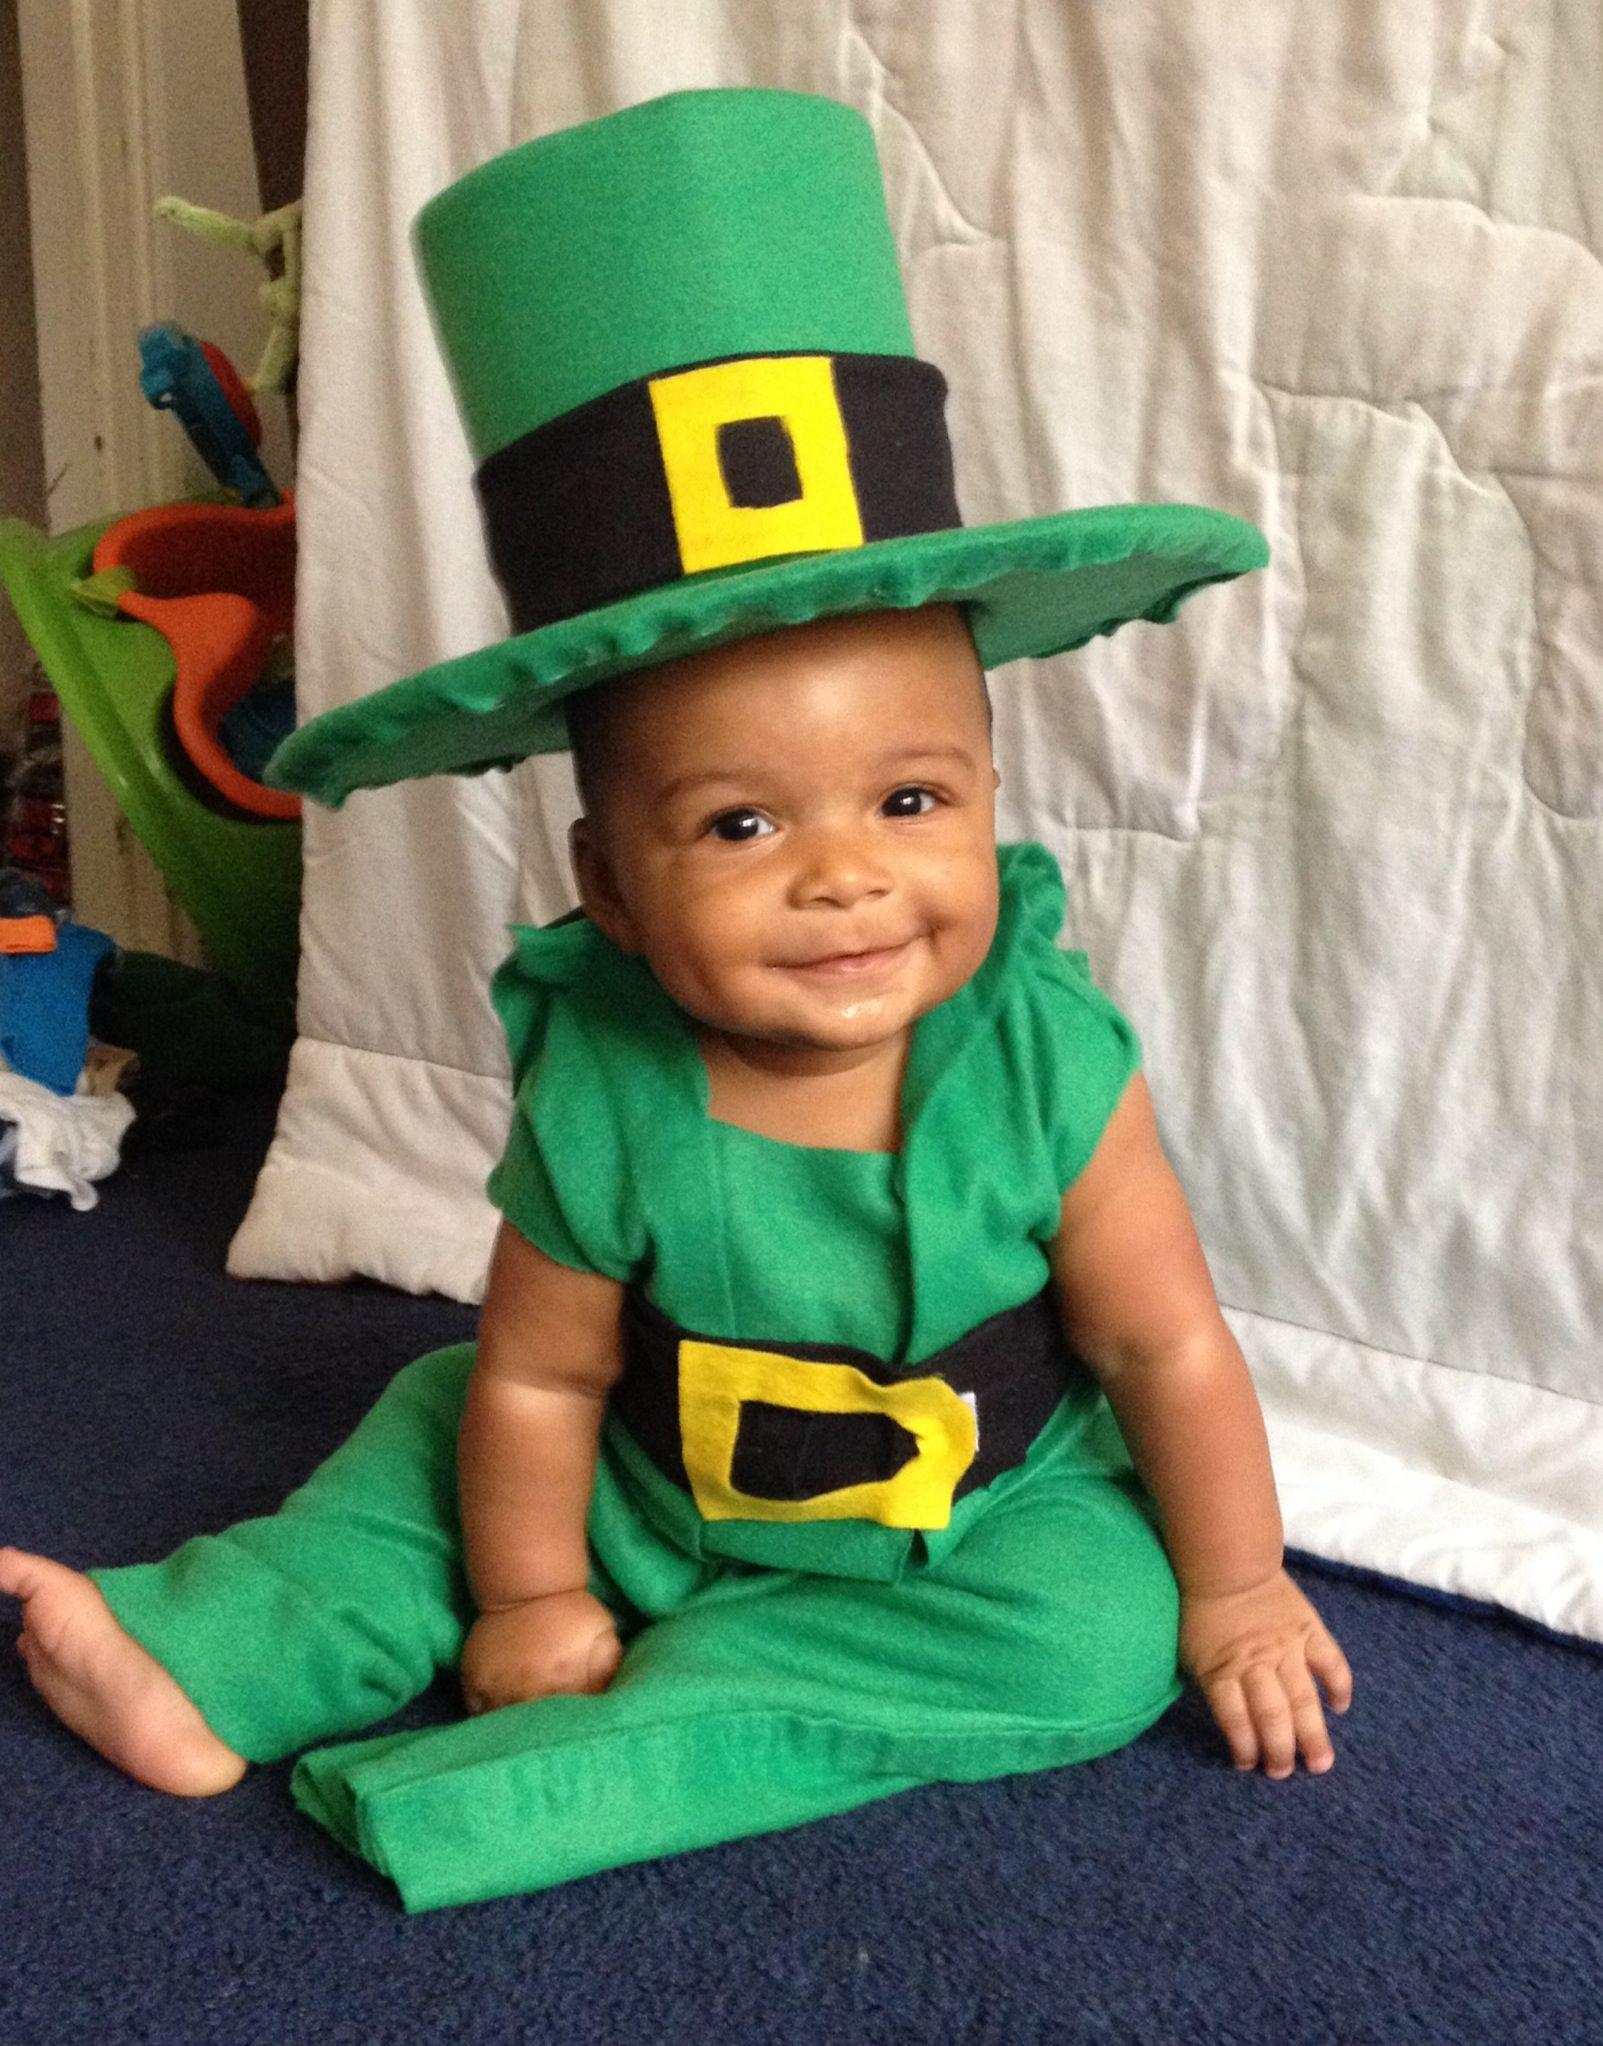 Best ideas about Leprechaun Costume DIY . Save or Pin DIY LEPRECHAUN COSTUME DIY CRAFTS Now.